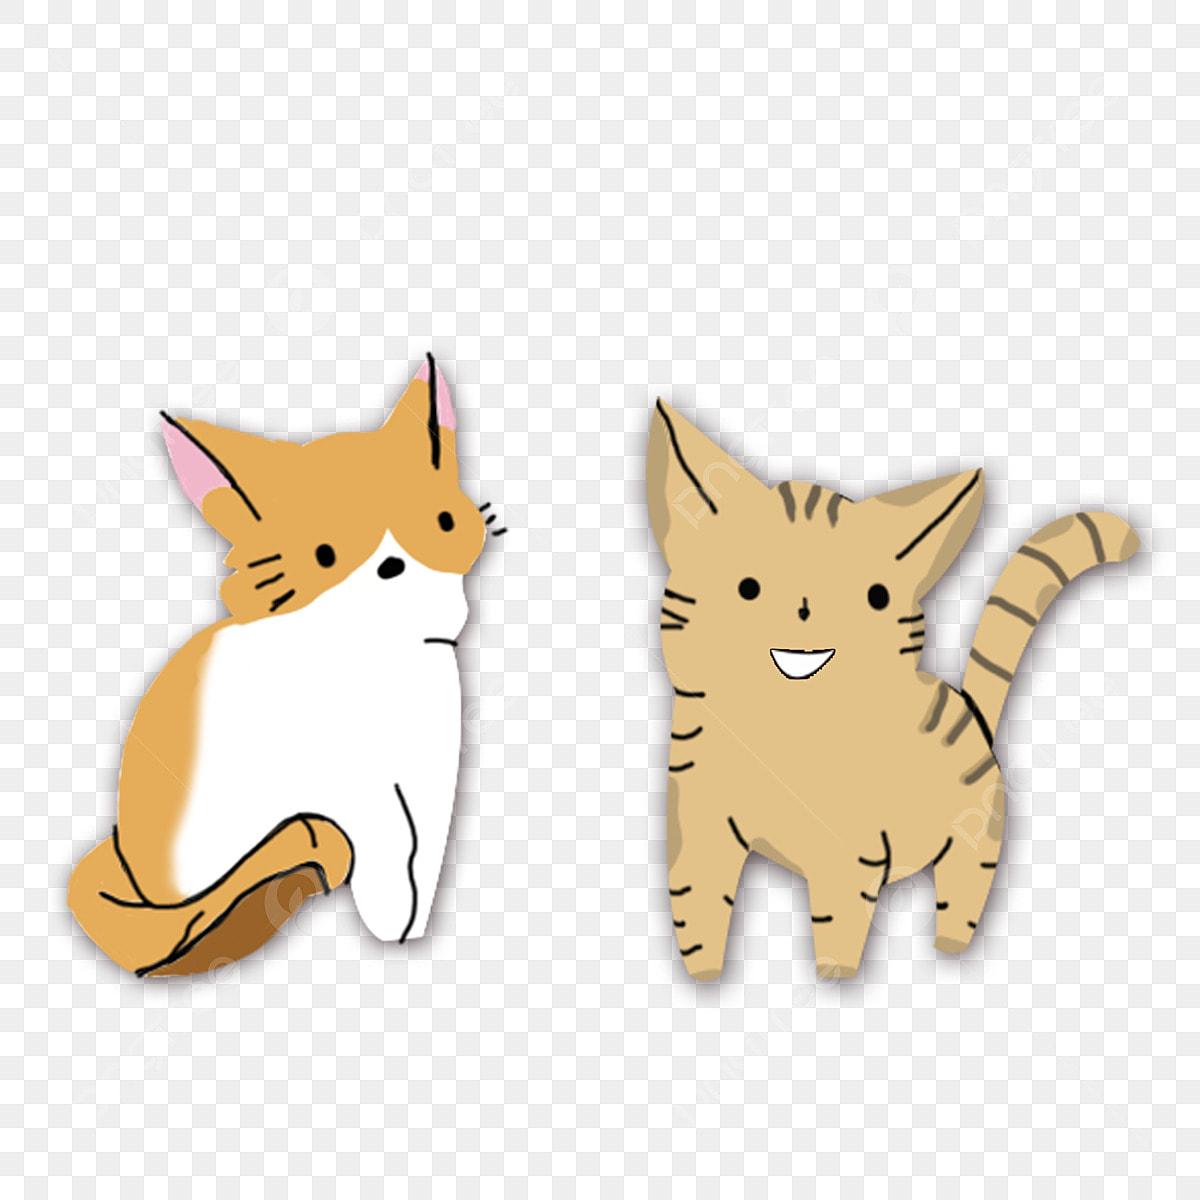 Download 93+  Gambar Kartun Kucing Dan Anjing Paling Imut HD